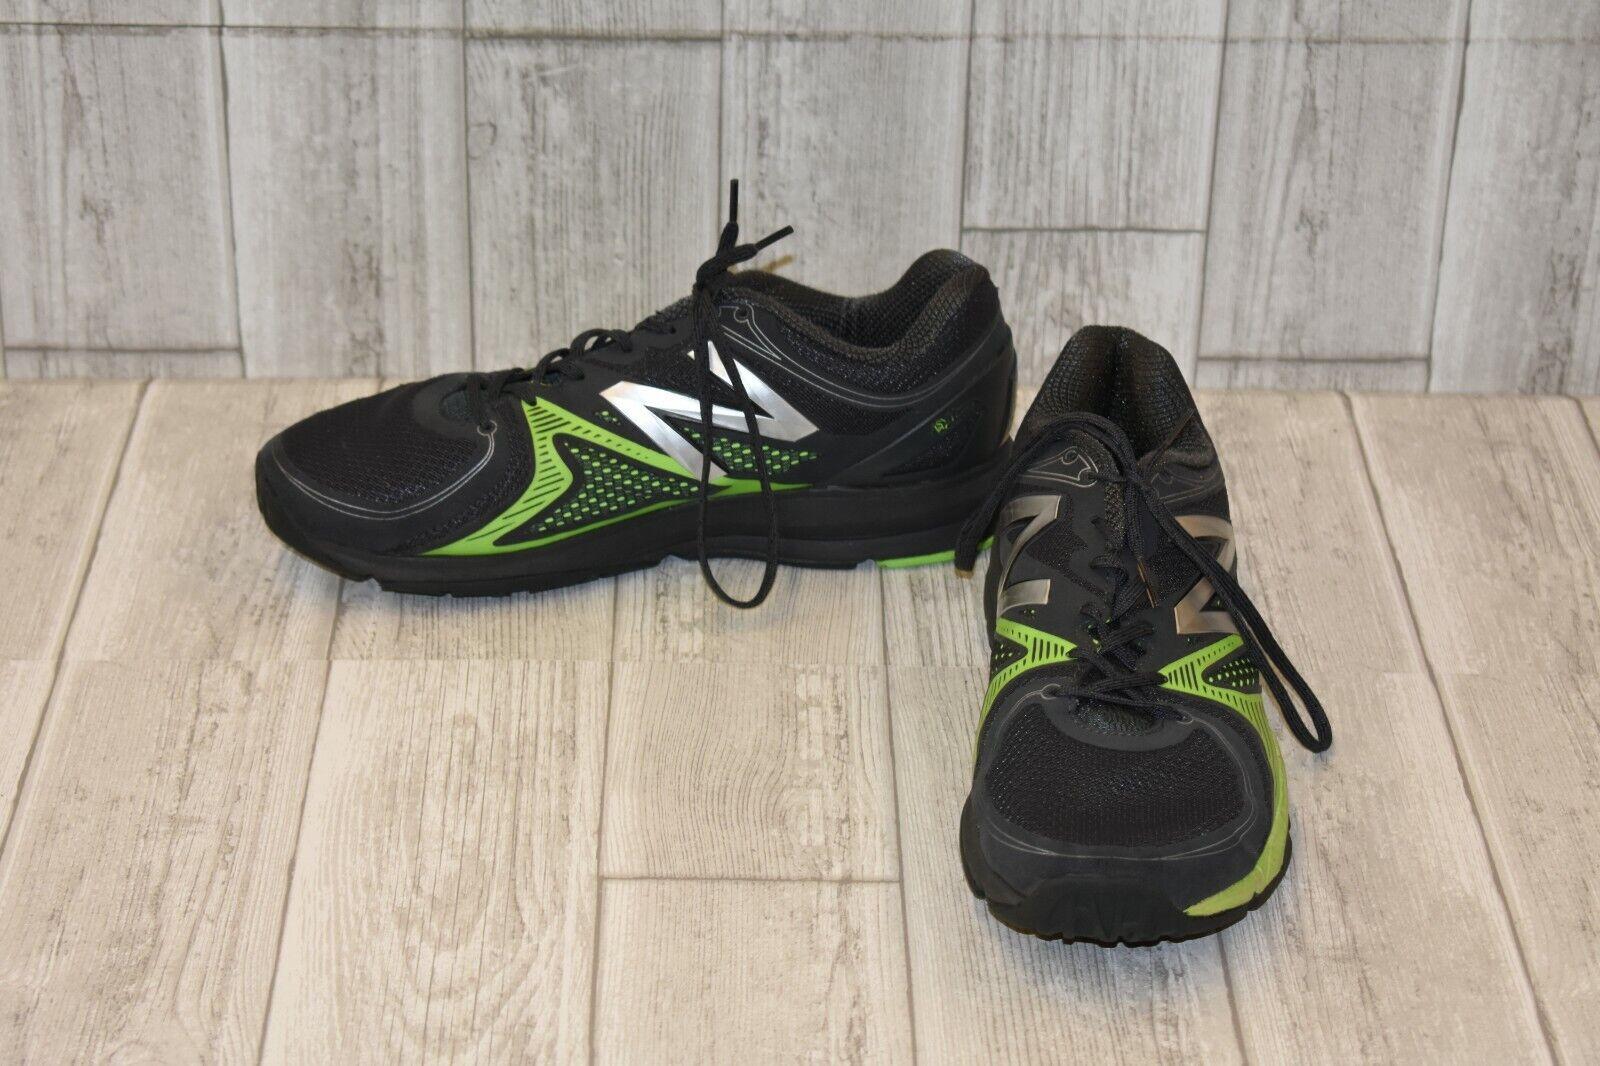 New Balance WX1267 Sneaker - Men's Size 11 D, Charcoal Green